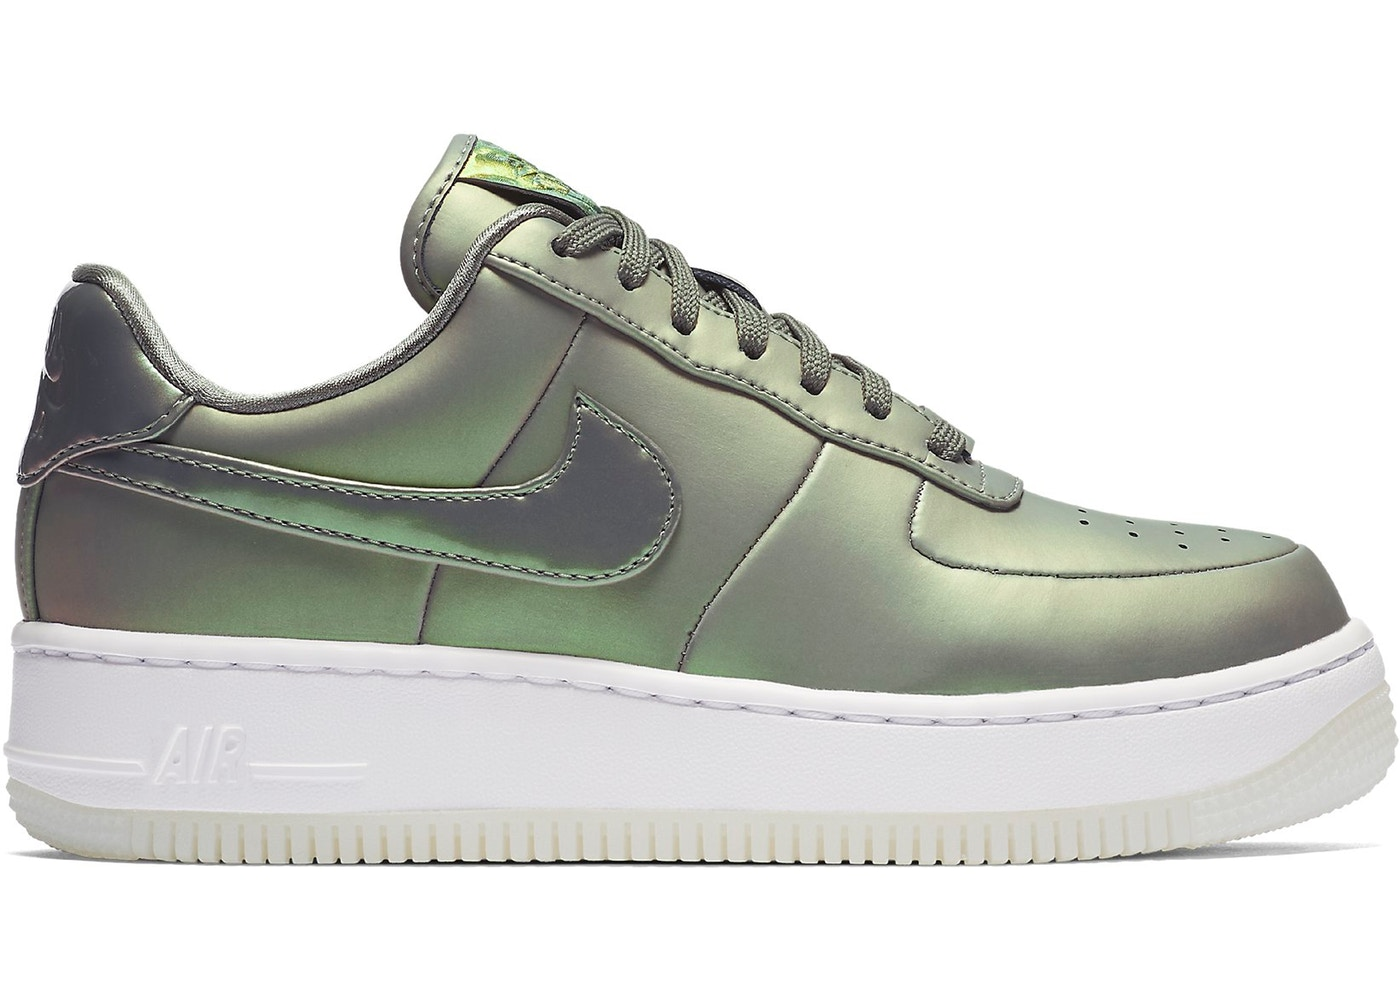 Nike Air Force 1 Upstep Low Shine (W)